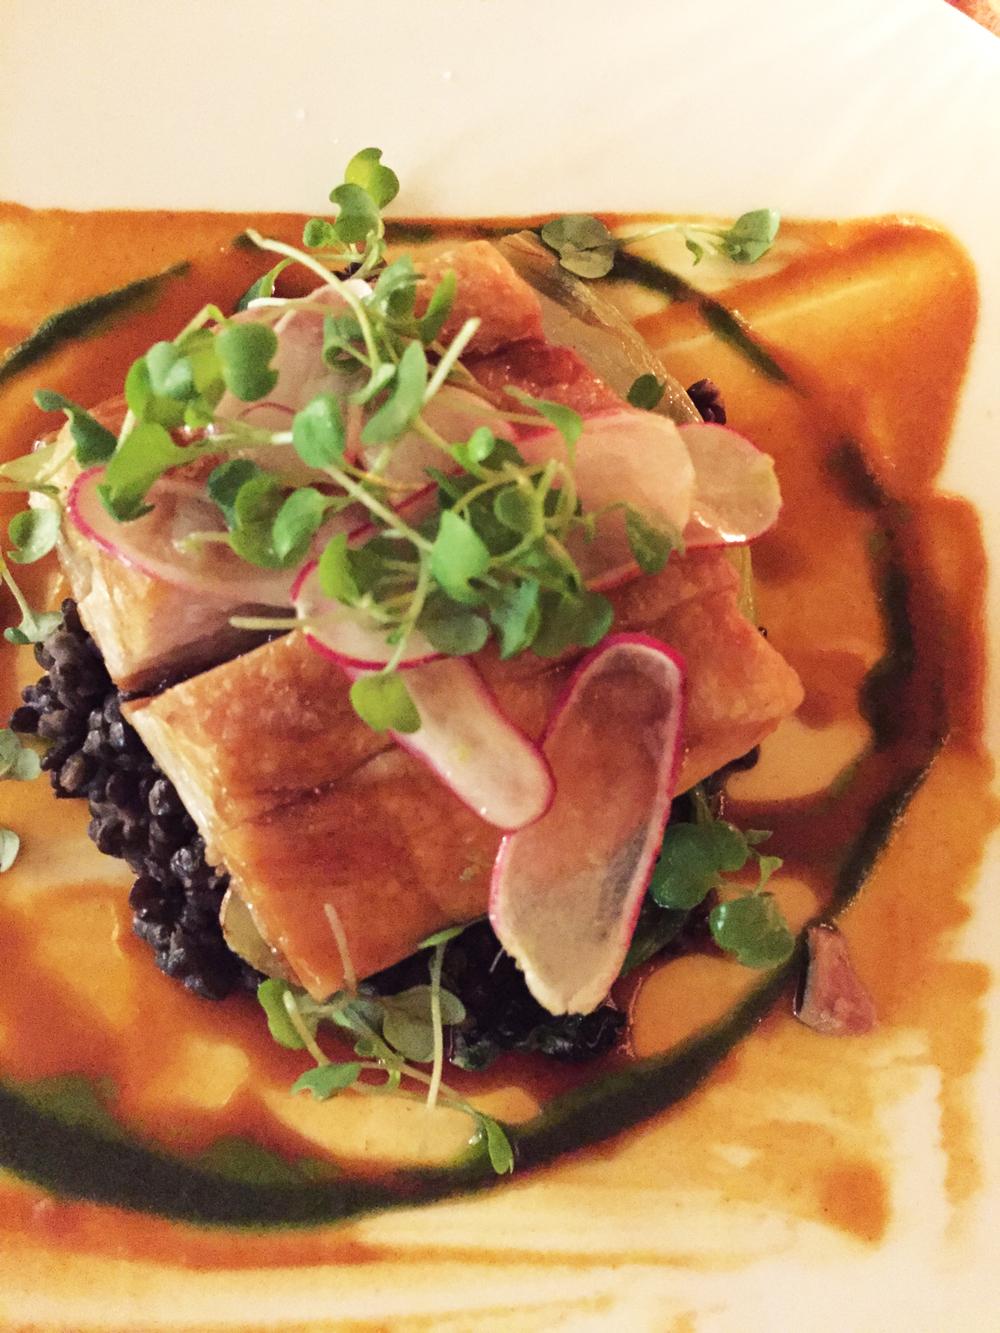 Niman Ranch Braised Pork Belly with creamy beluga lentils, sautéed bokchoy, and radish salad.